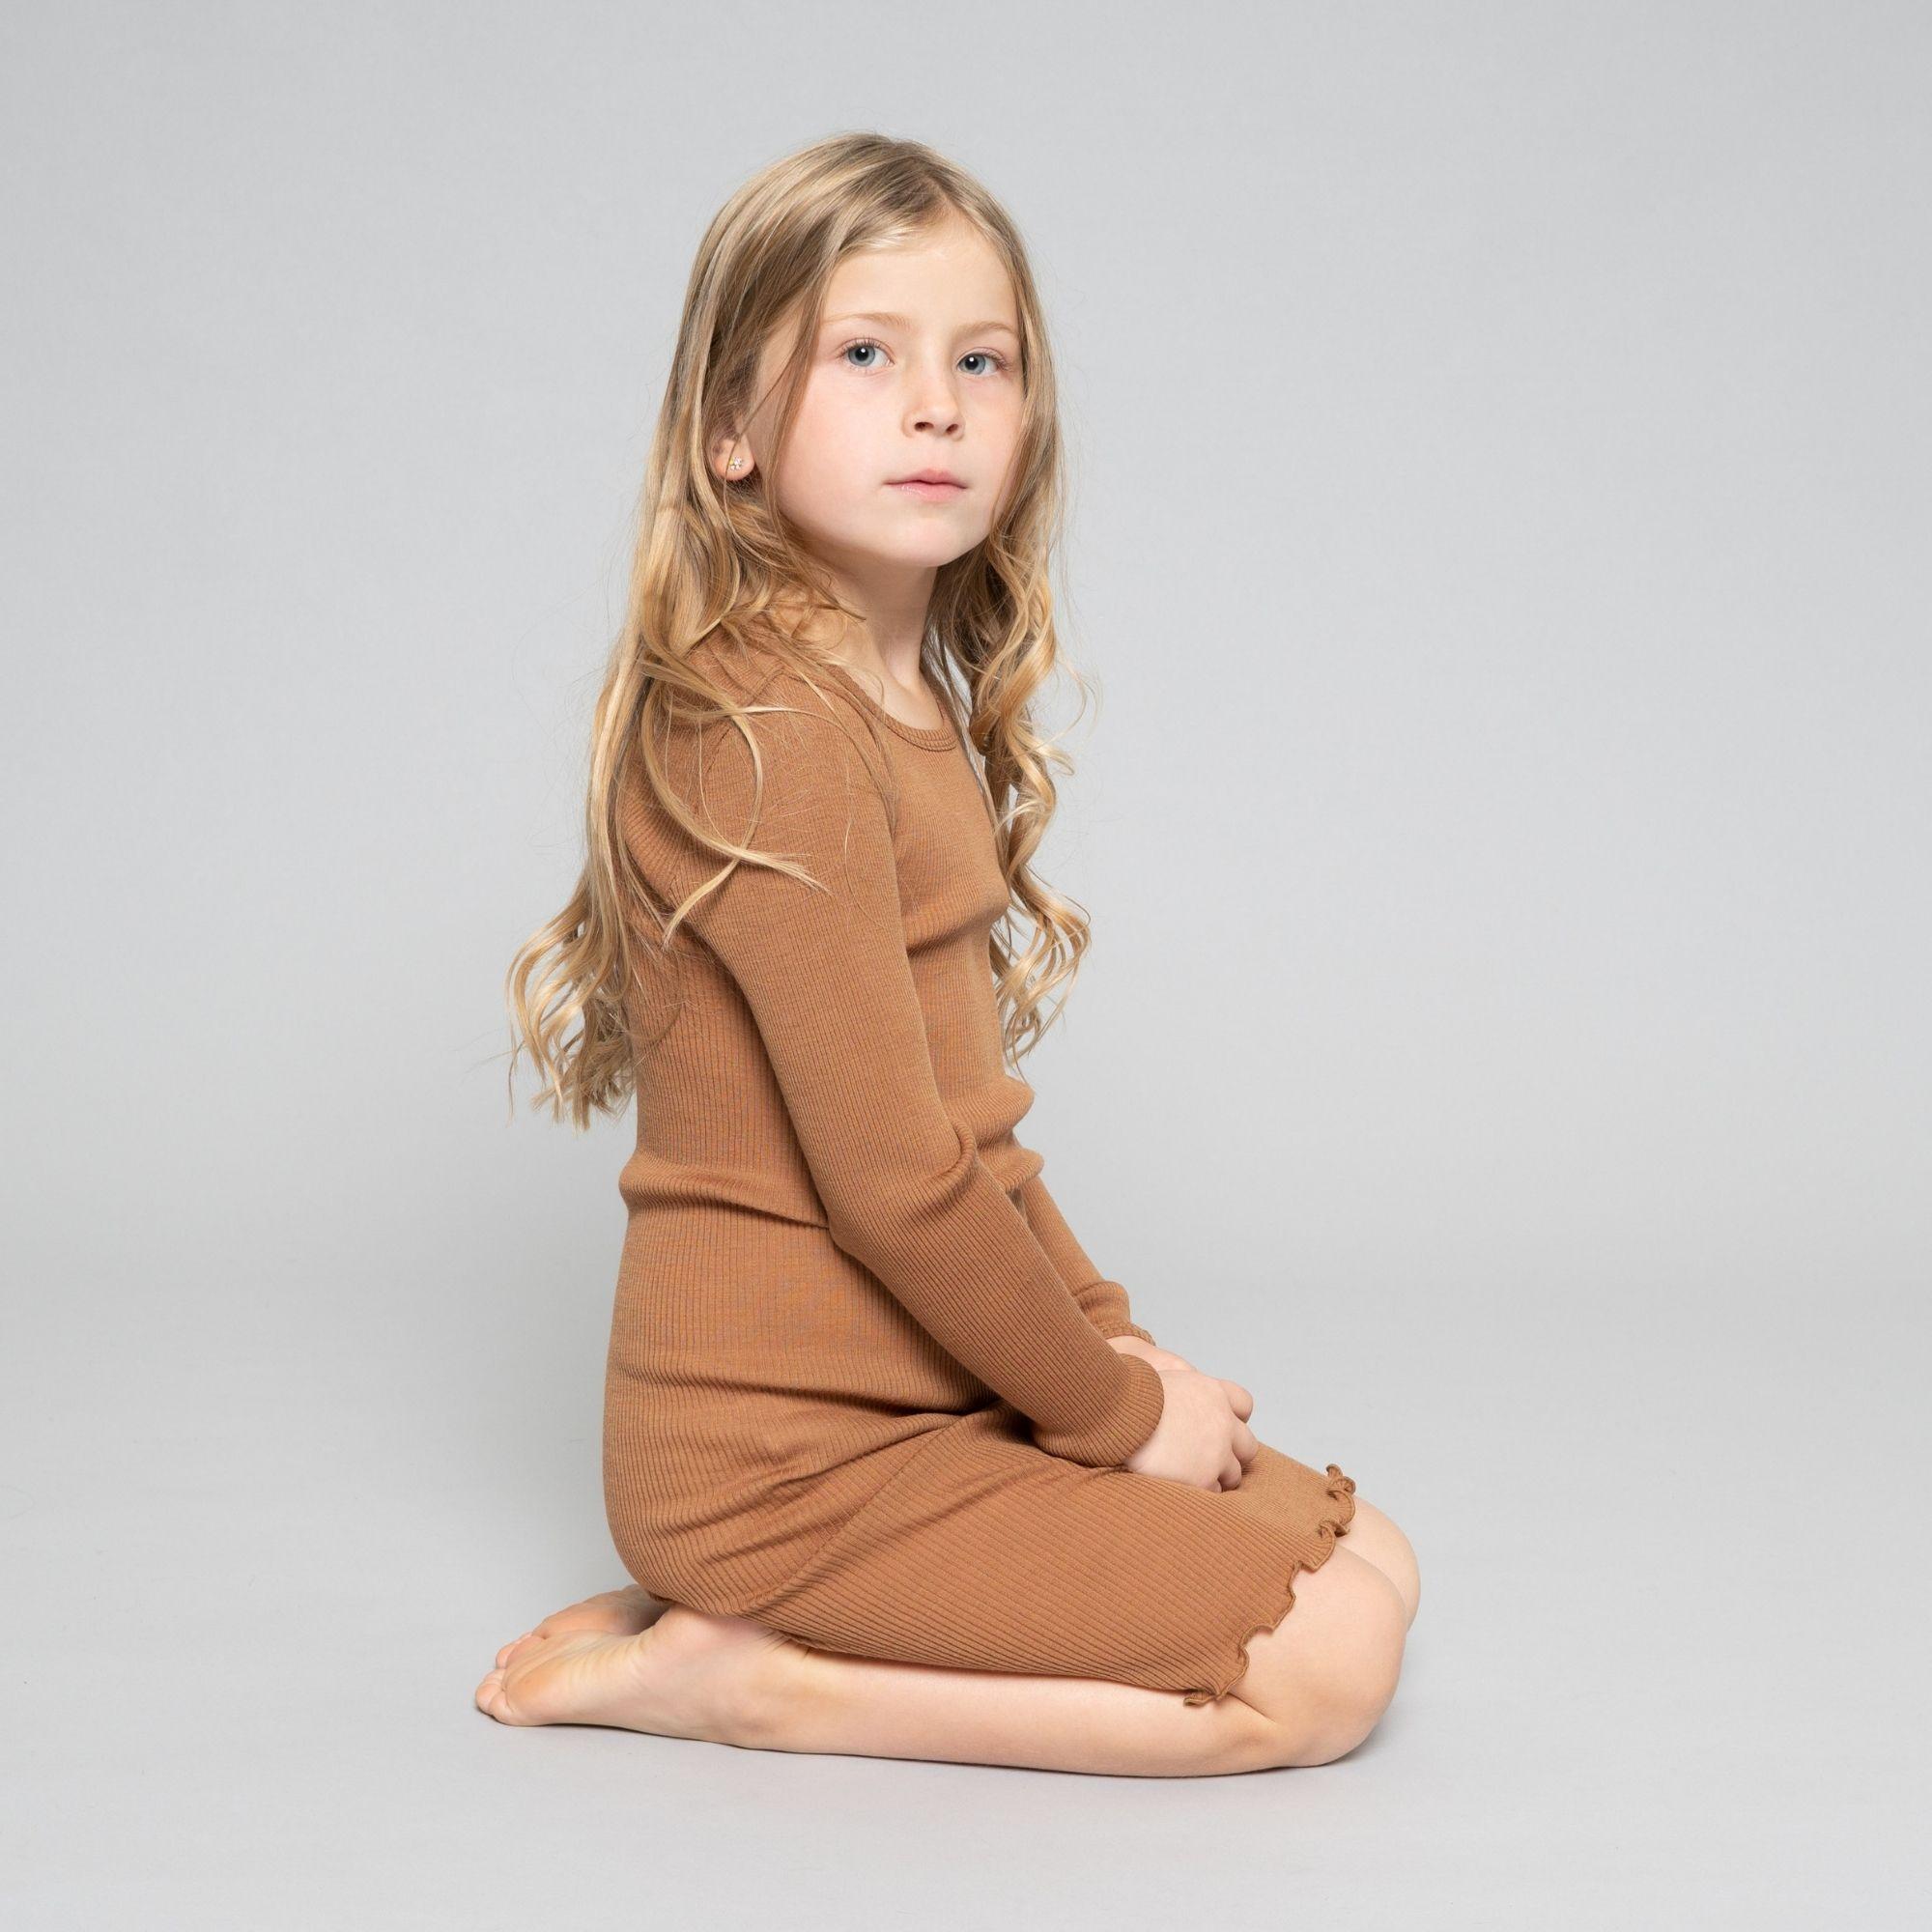 robe-manches-longues-enfant-pure-laine-merinos-minimalisma-maison-de-mamoulia-ada-caramel---